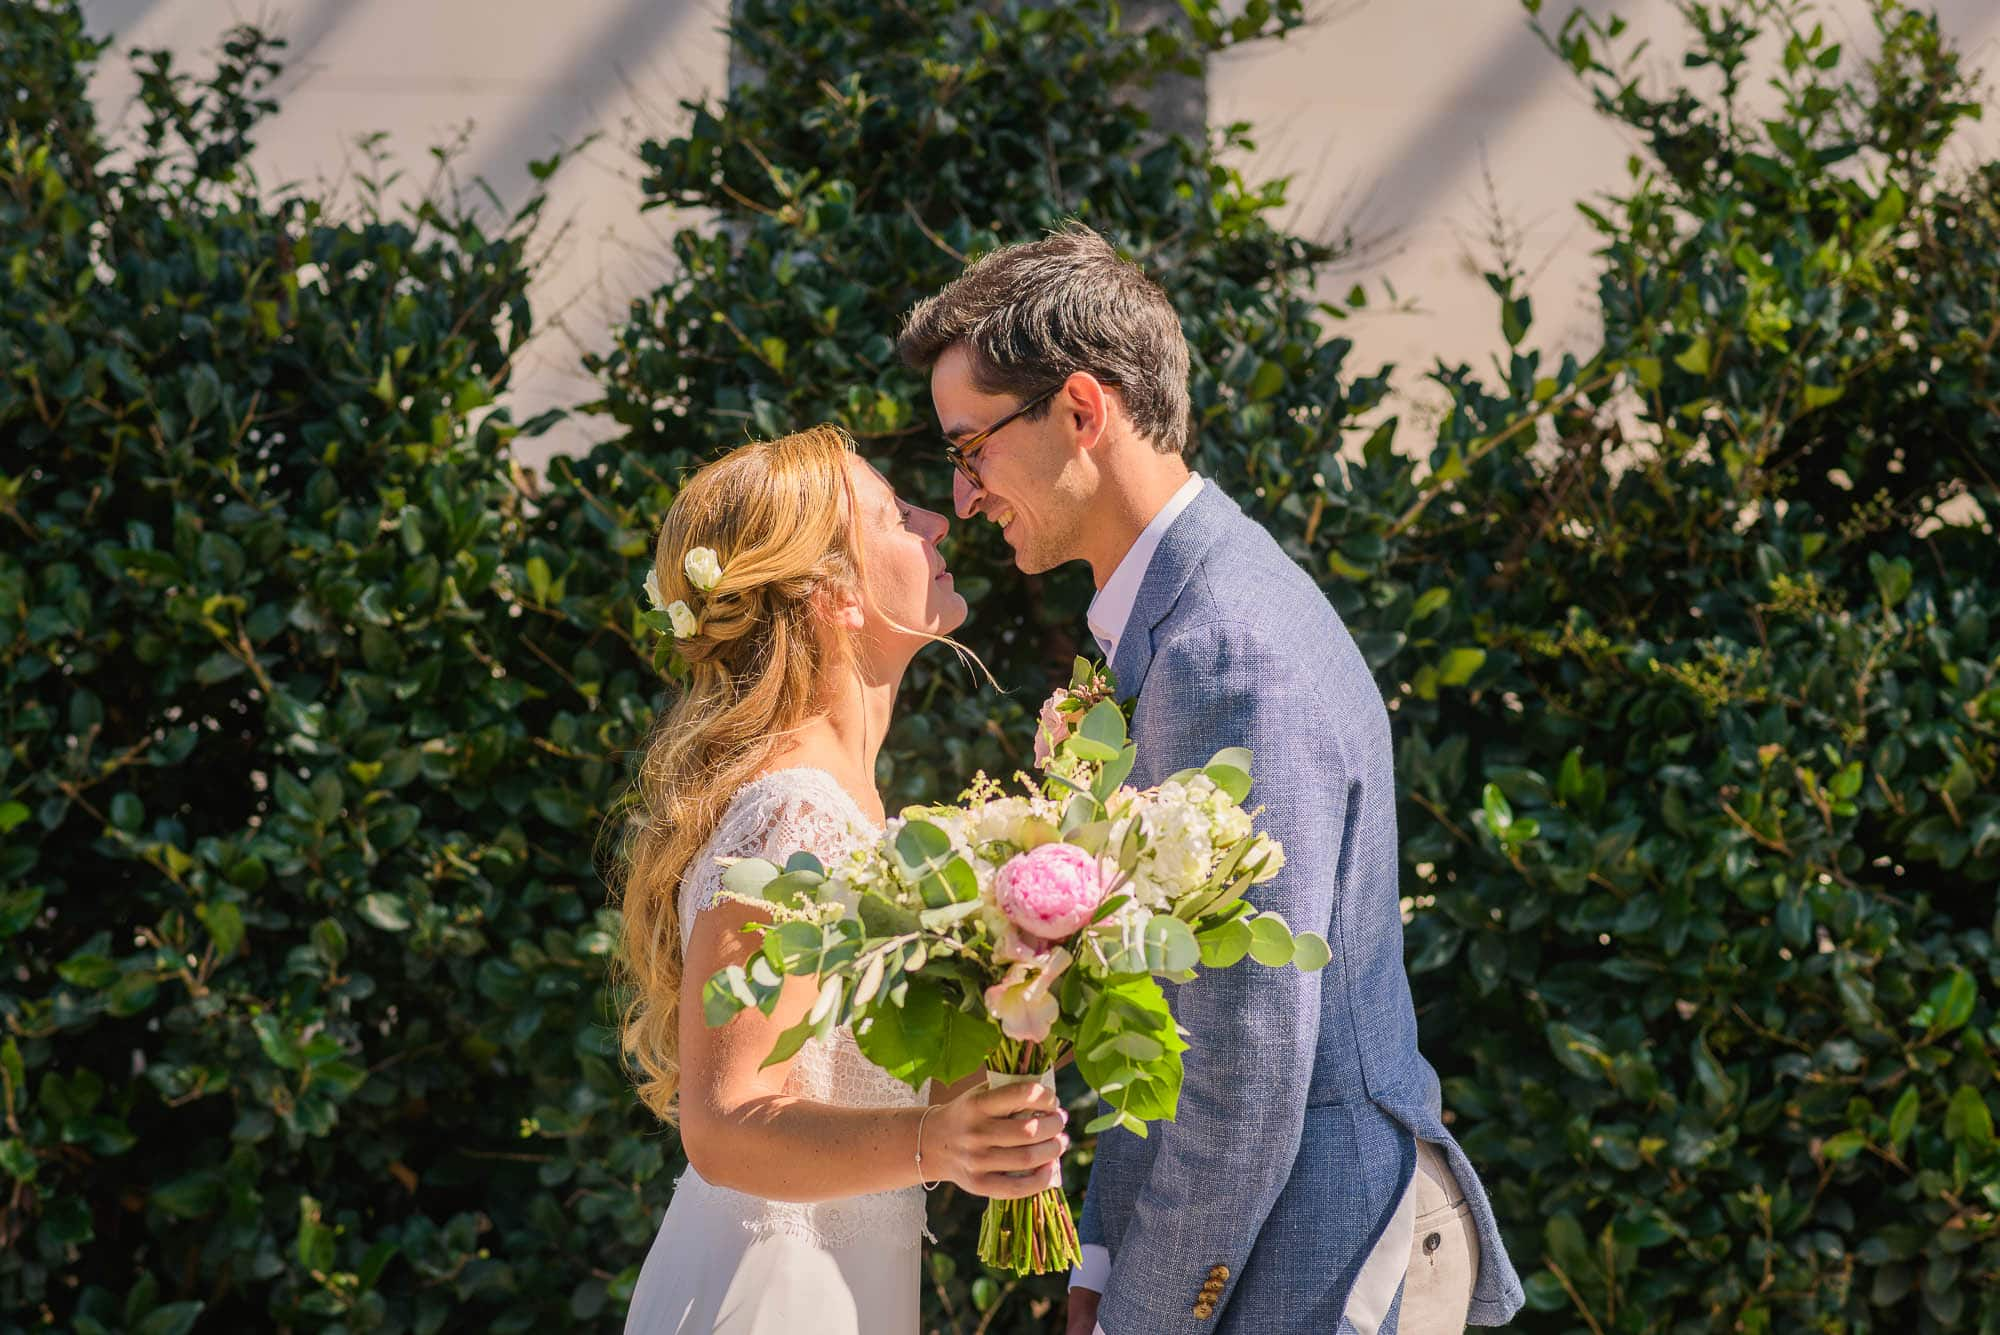 012_Alan_and_Heidi_Wedding_Verena_Andreas